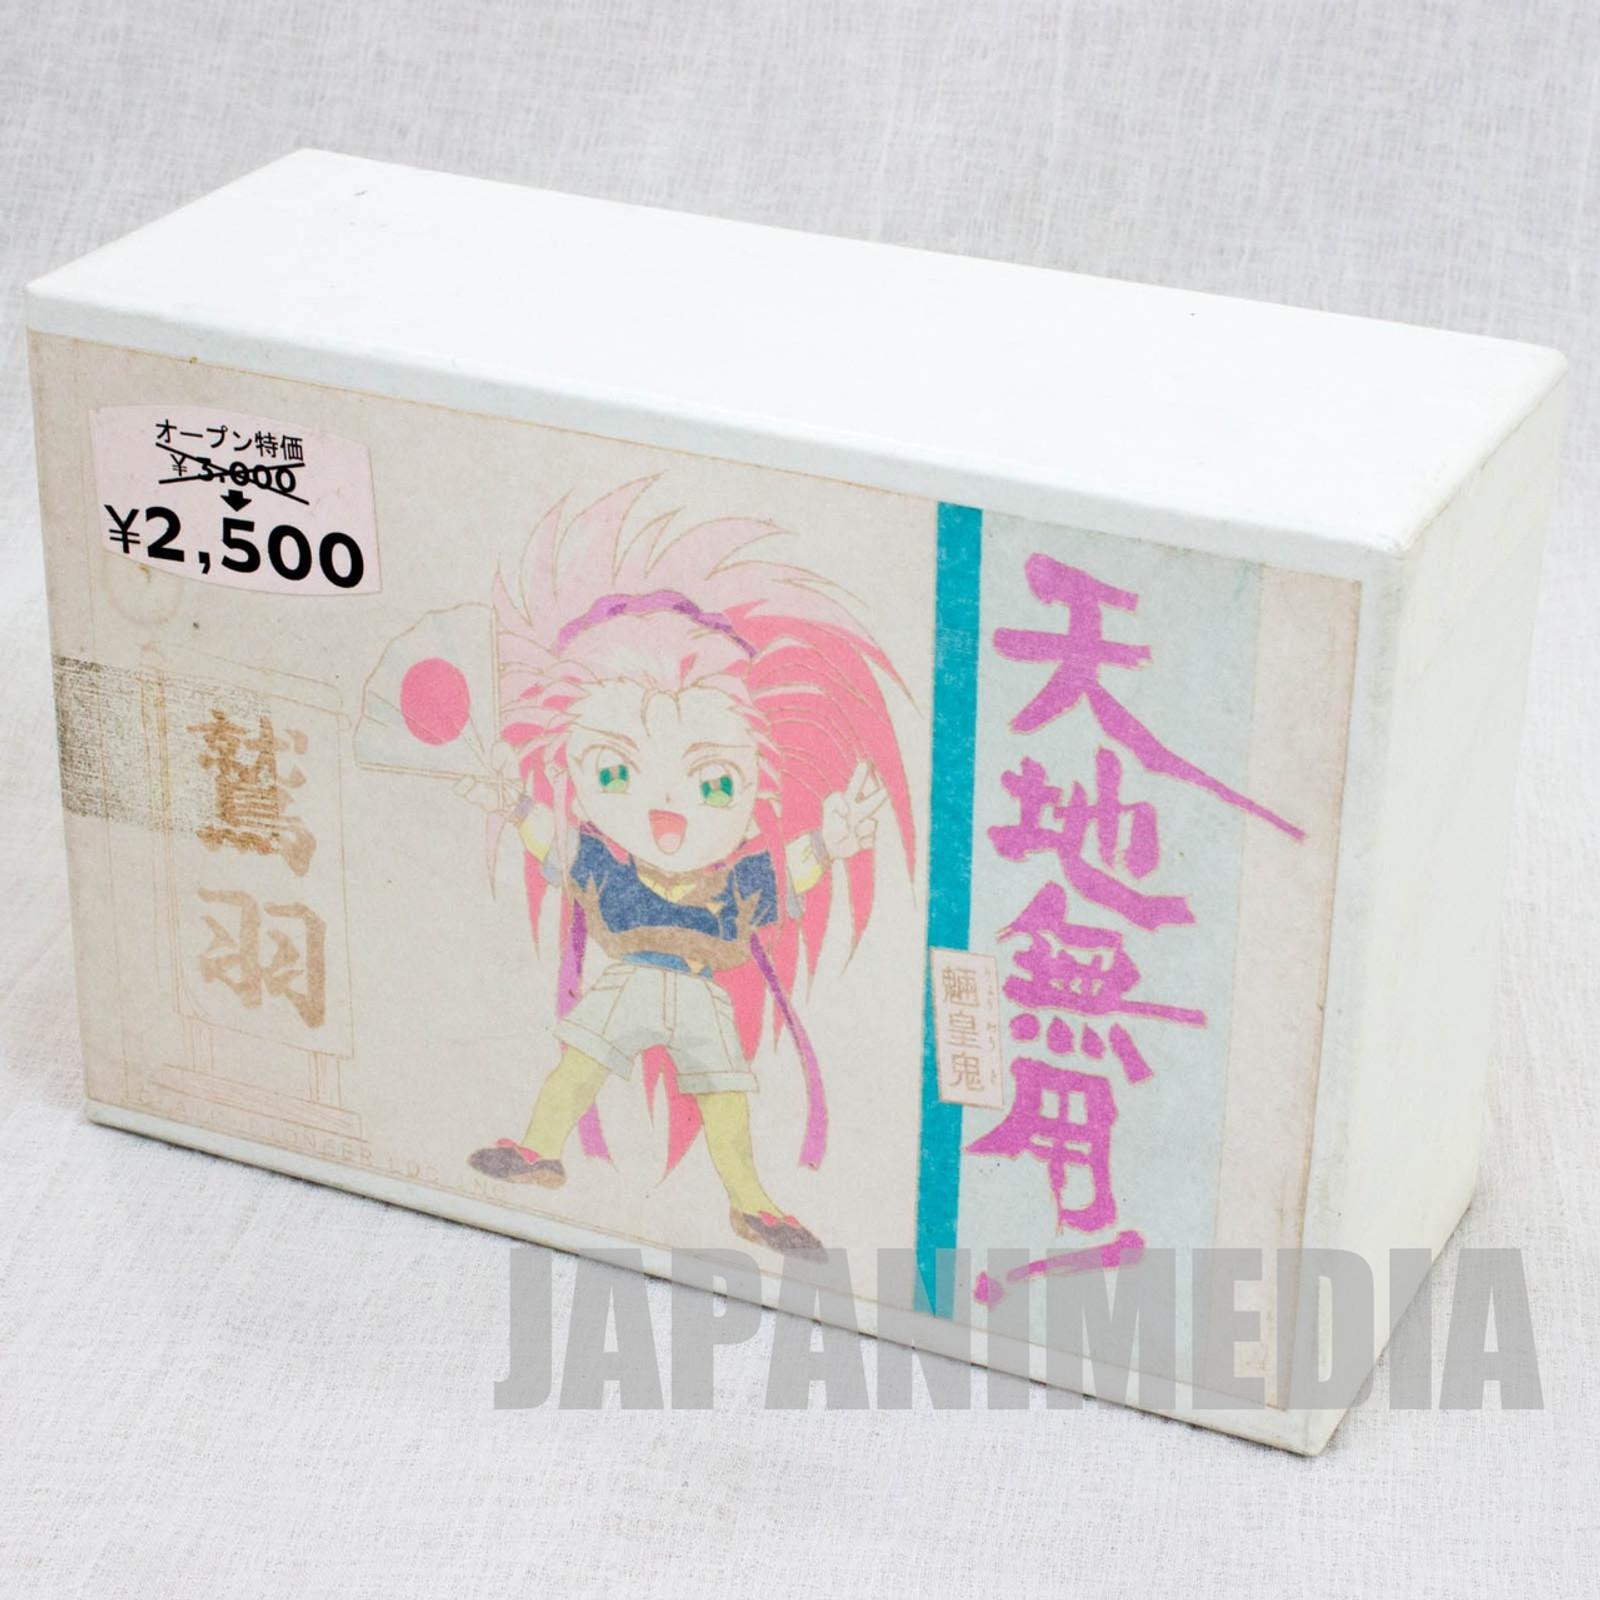 Tenchi Muyo! Ryo-ohki Washu Hakubi Model Kit JAPAN ANIME MANGA